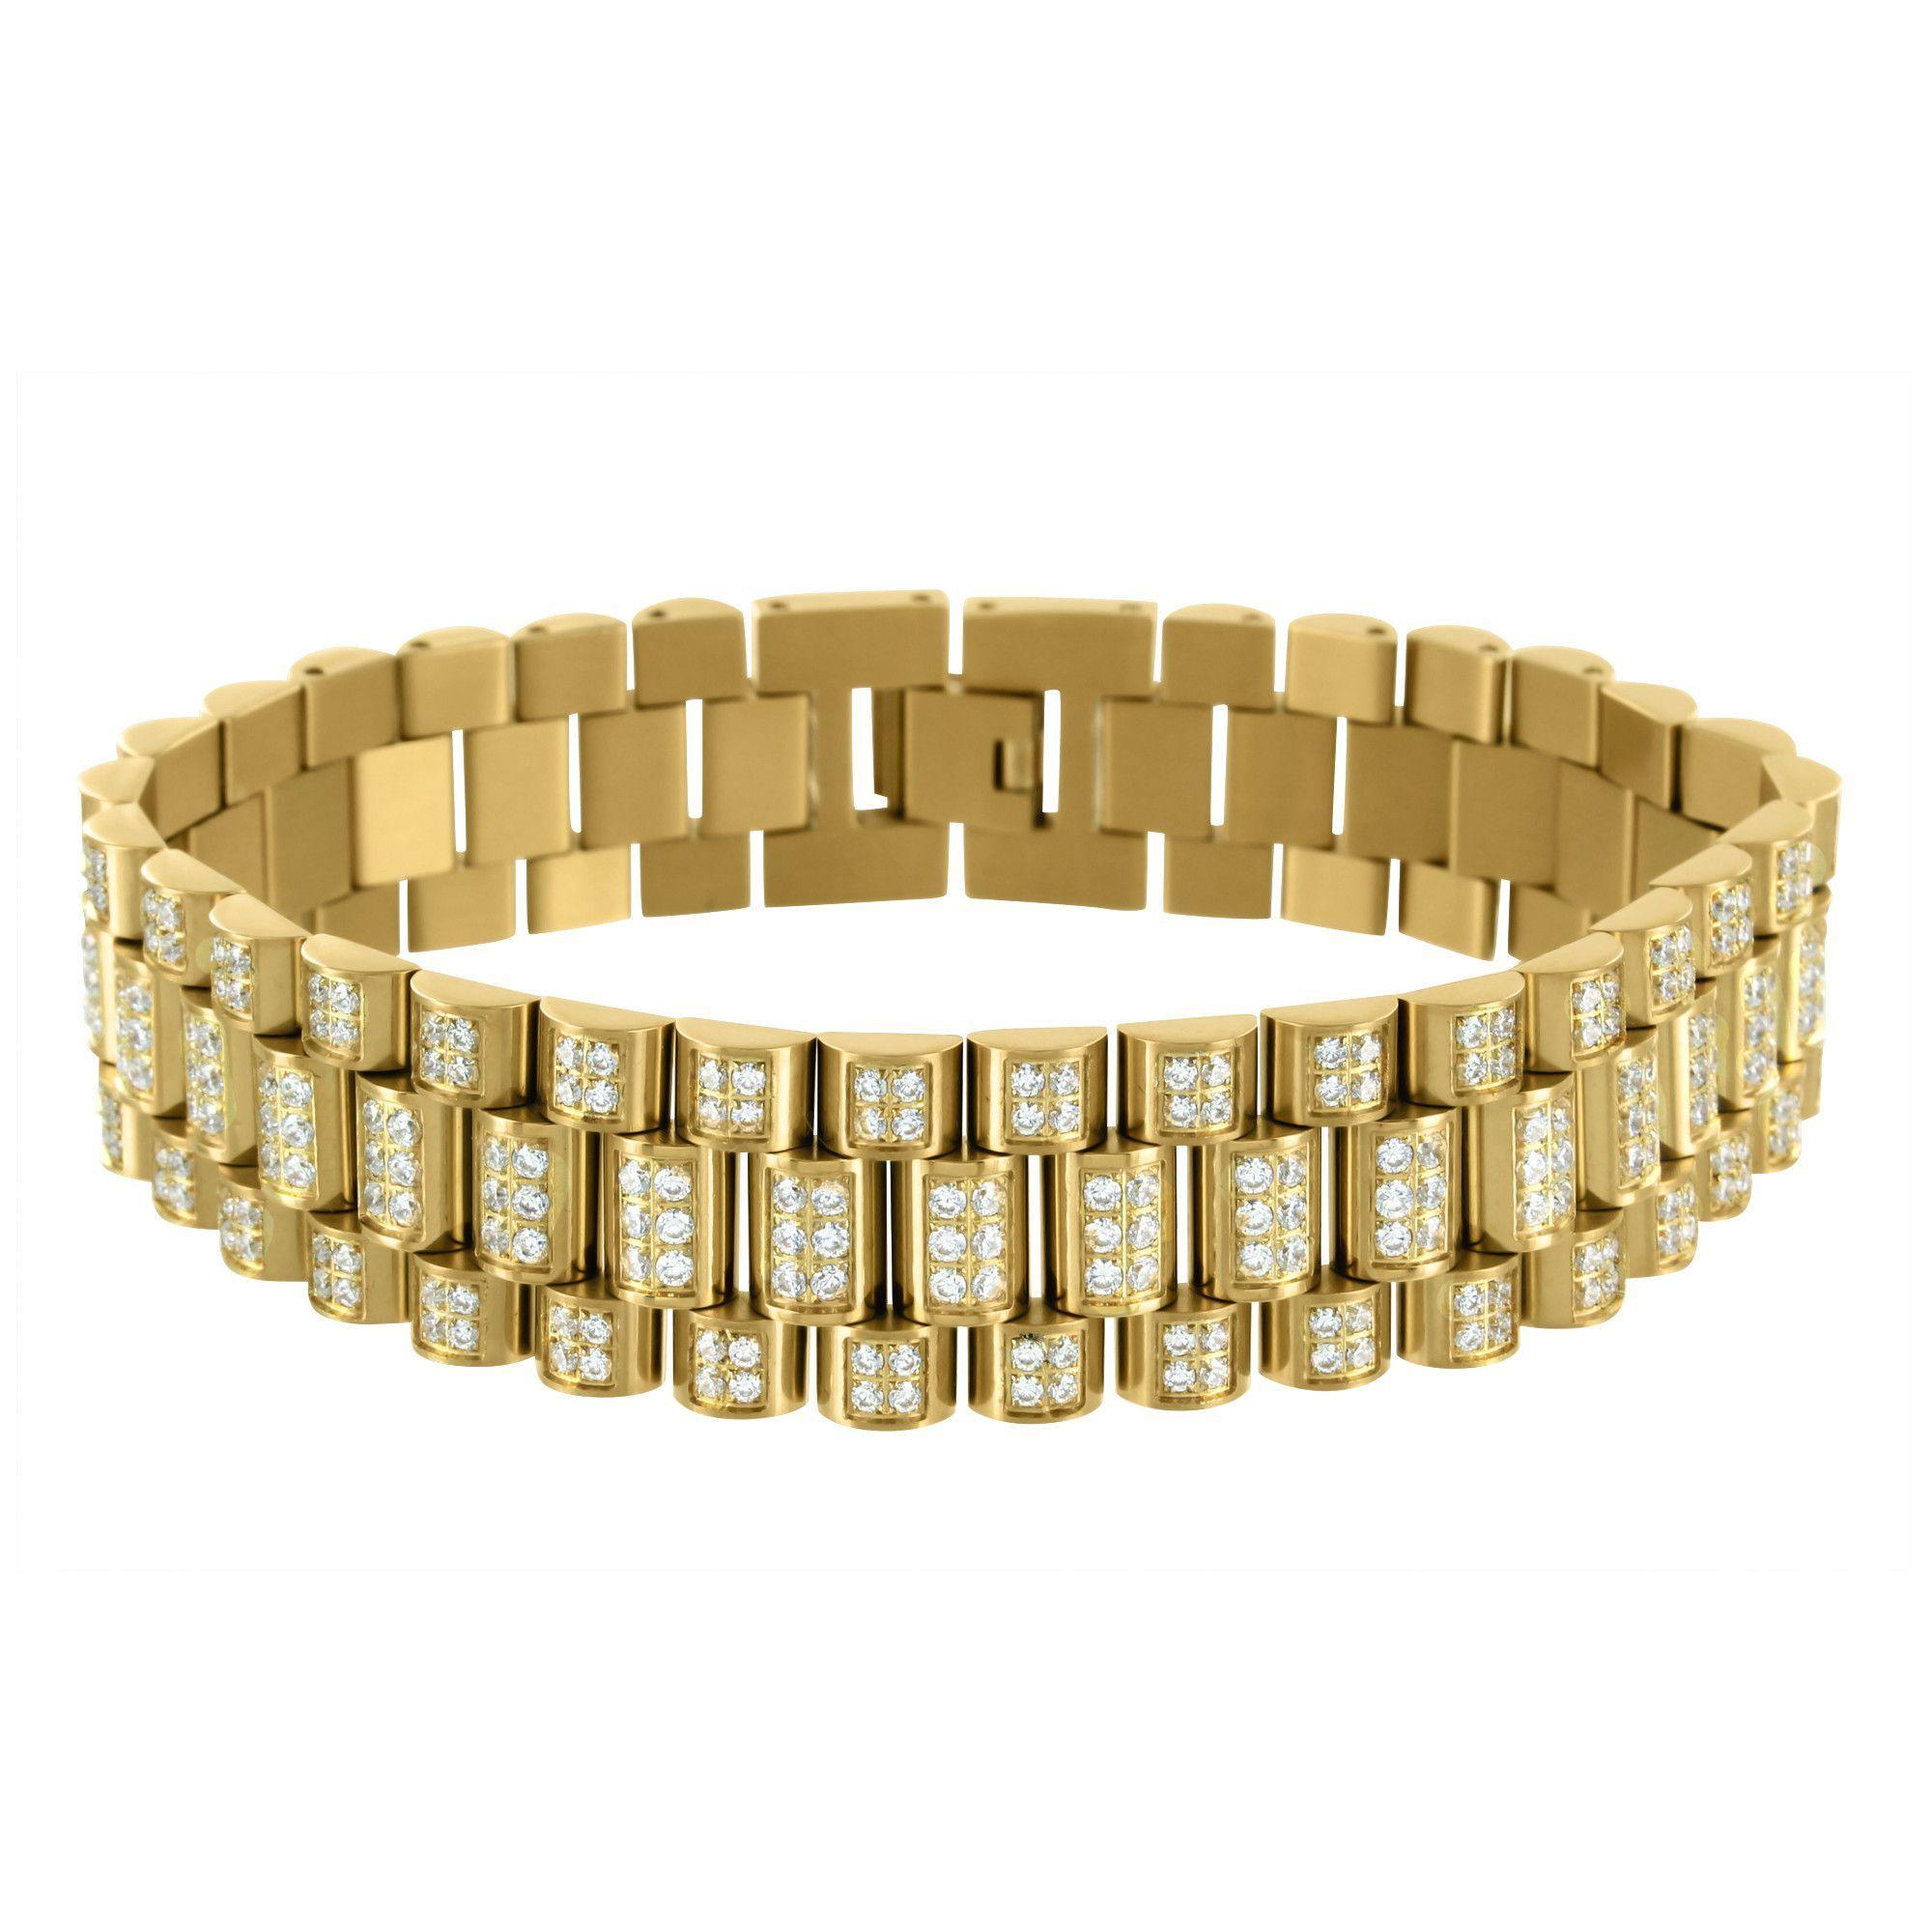 Allurez Polished and Textured Fine Fashion Link Bracelet 14k Two-Tone Gold